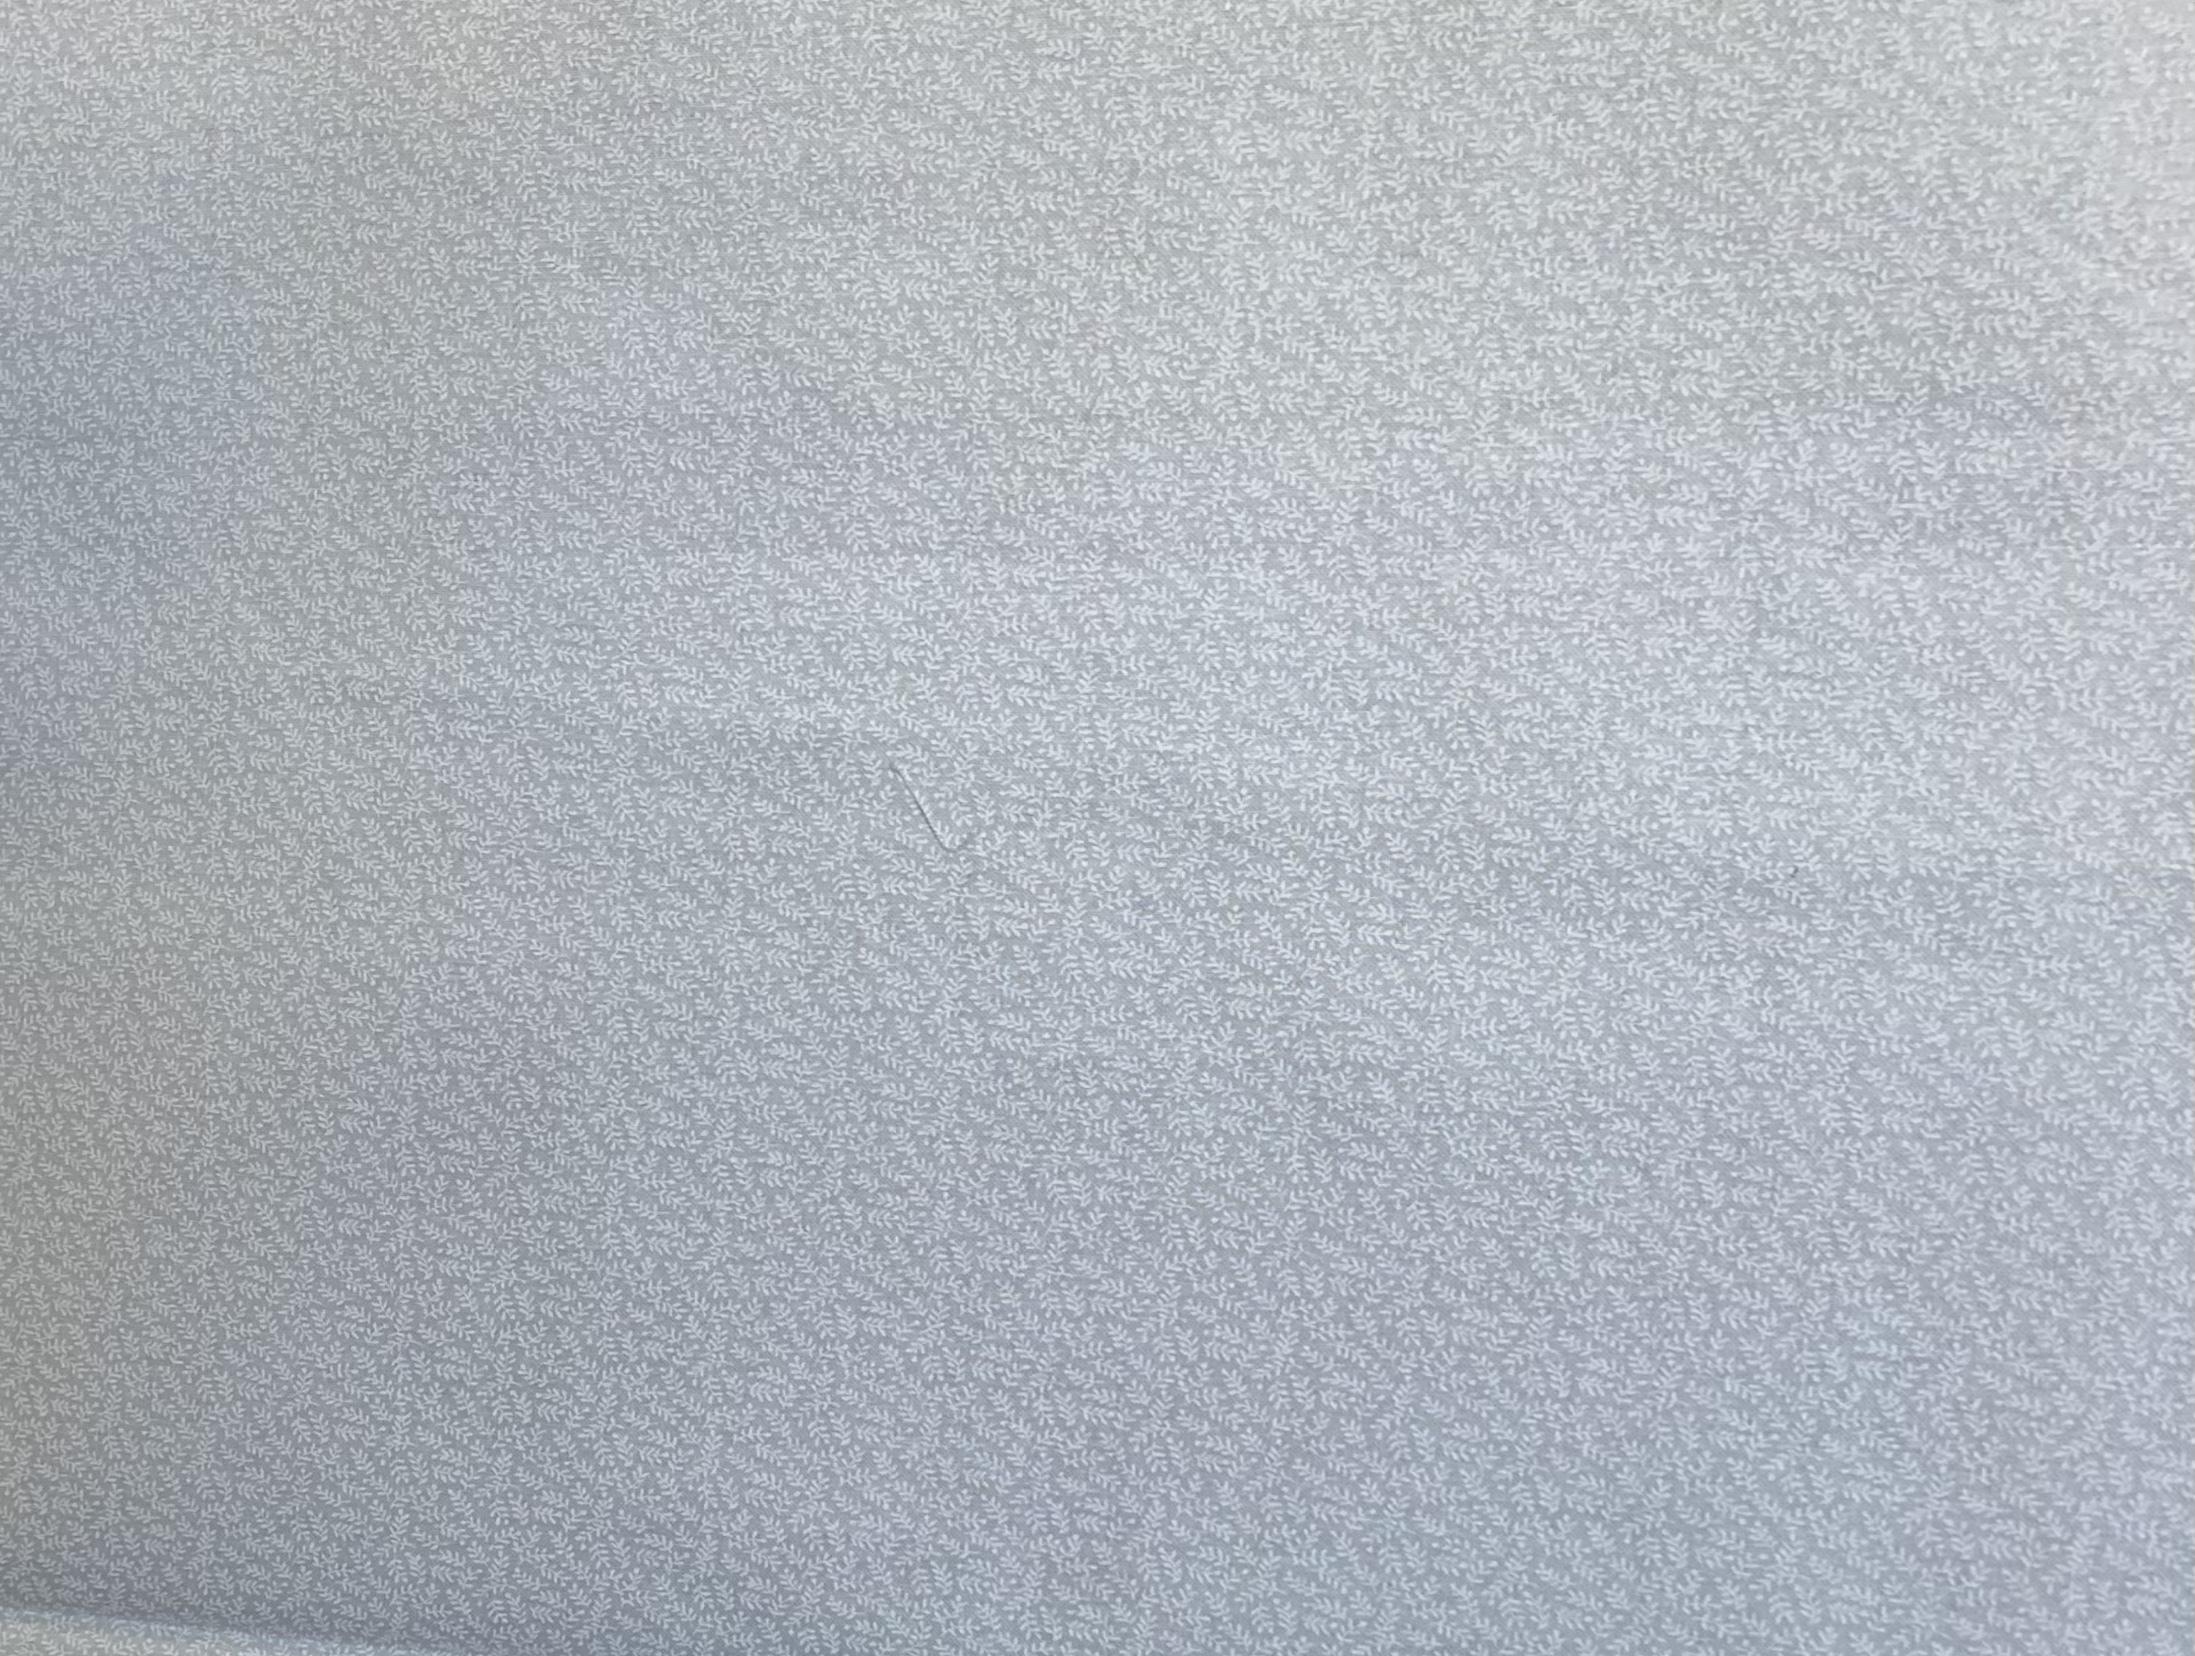 White Tone on Tone - Ferns - 1/2m cut 57714